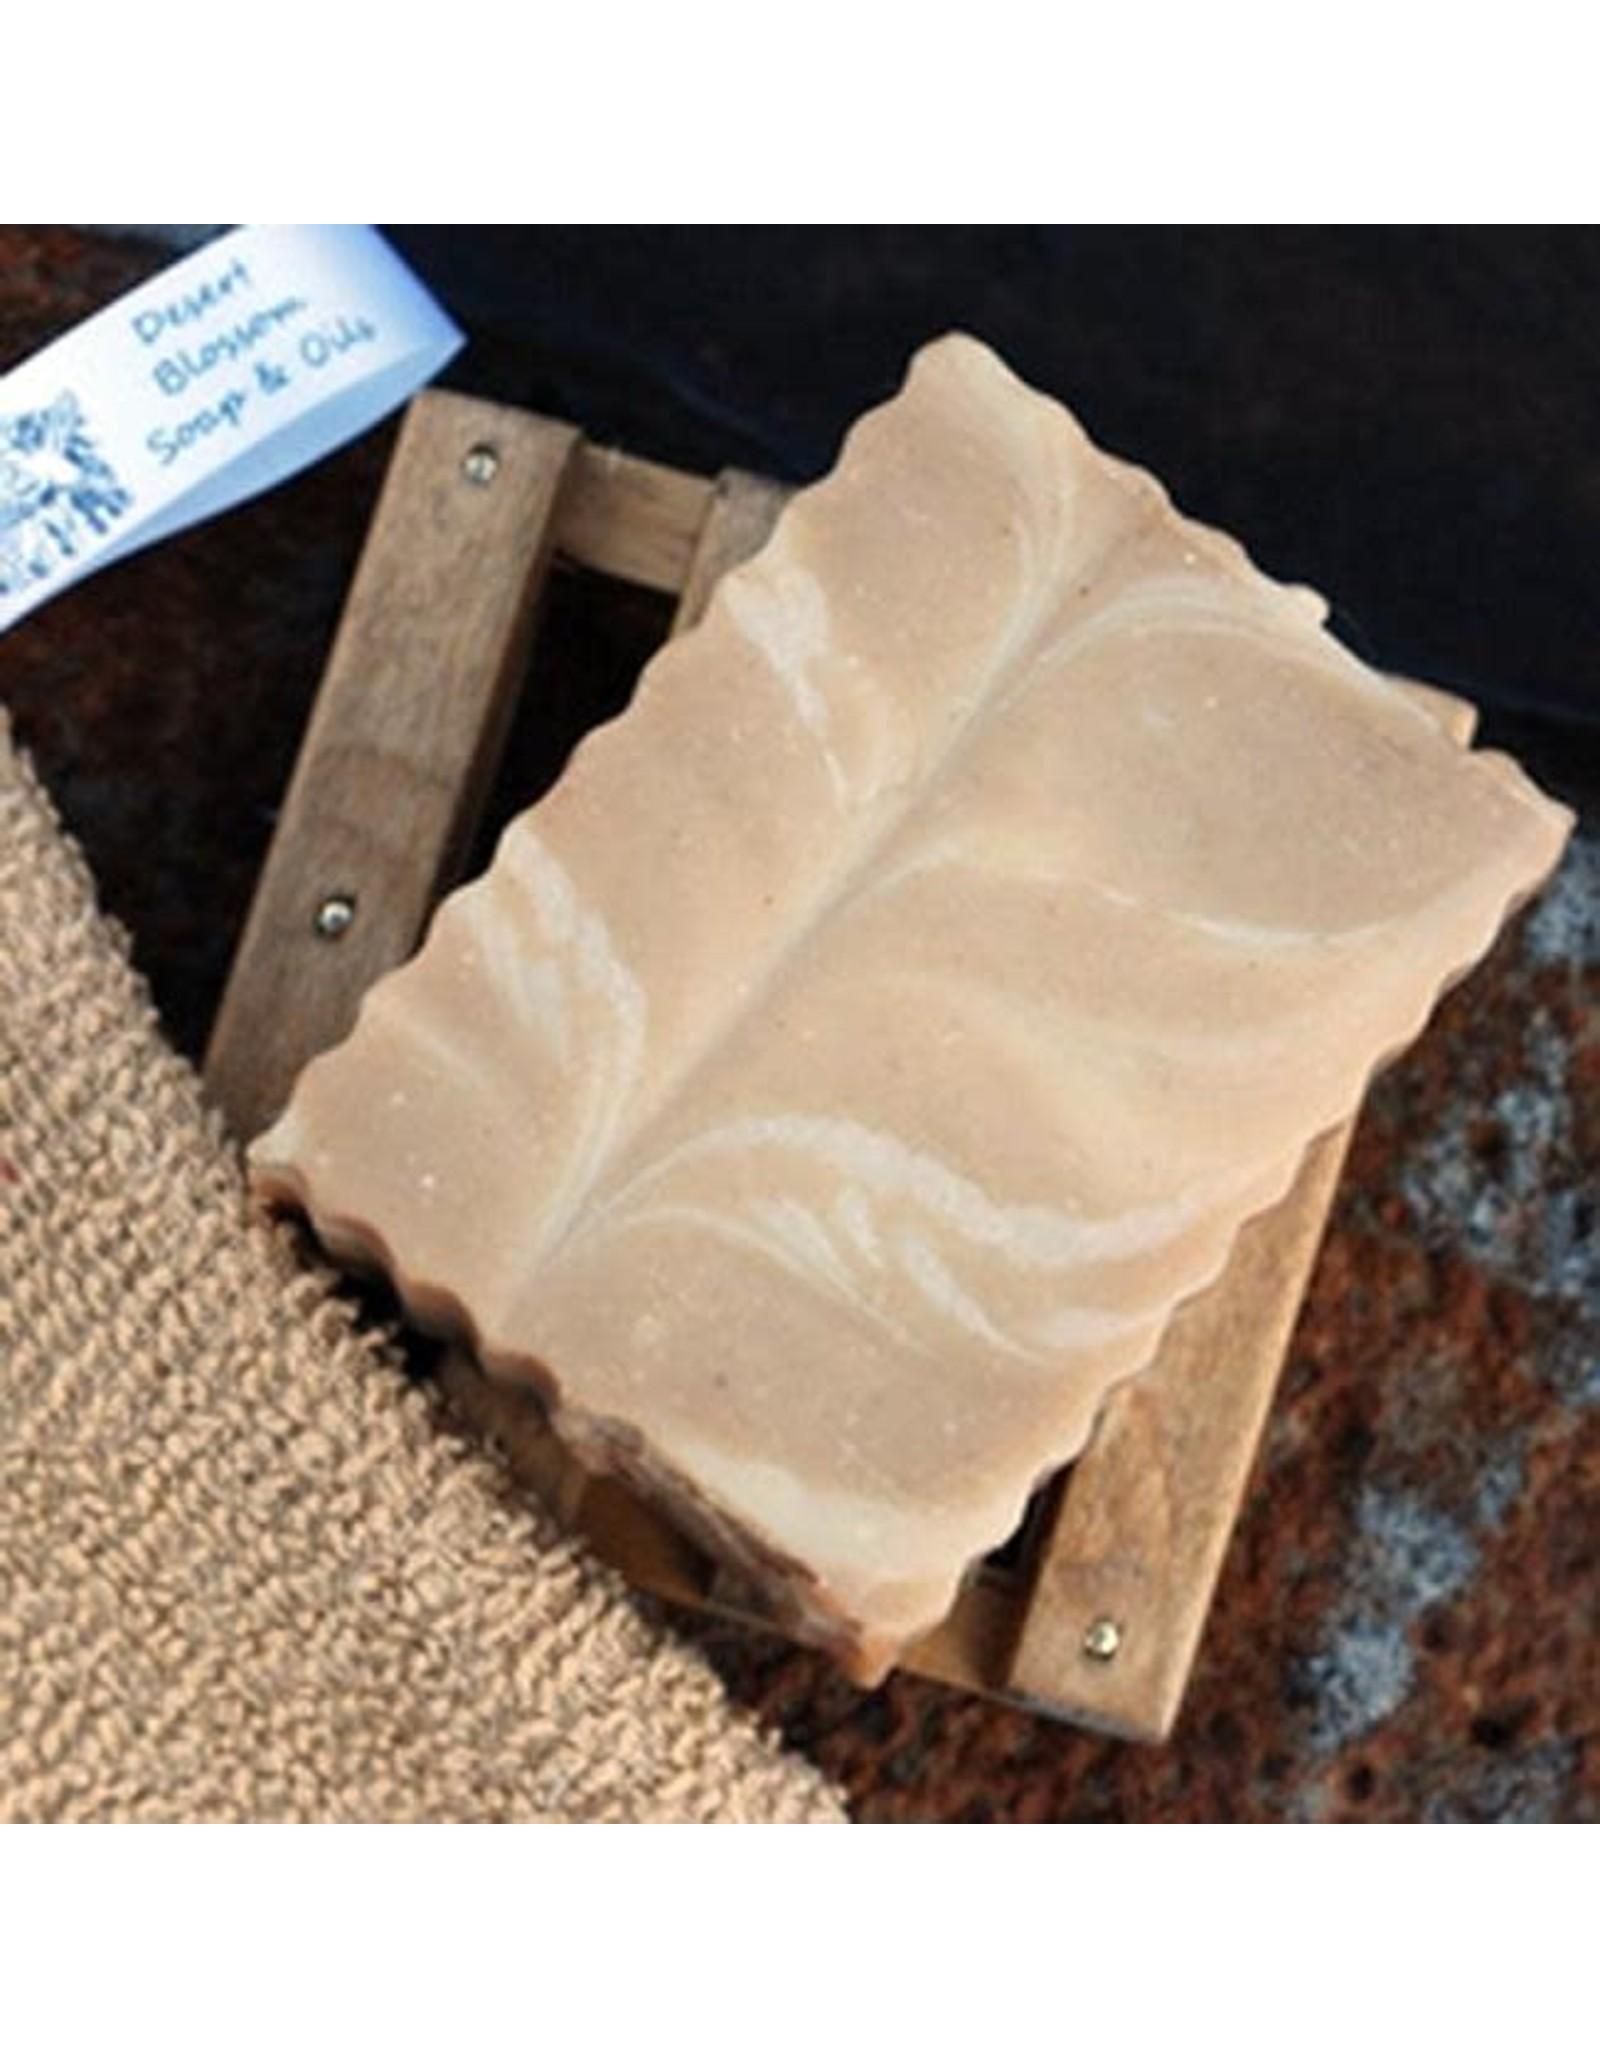 Desert Blossom Soap Inspire Farms Handmade Soap